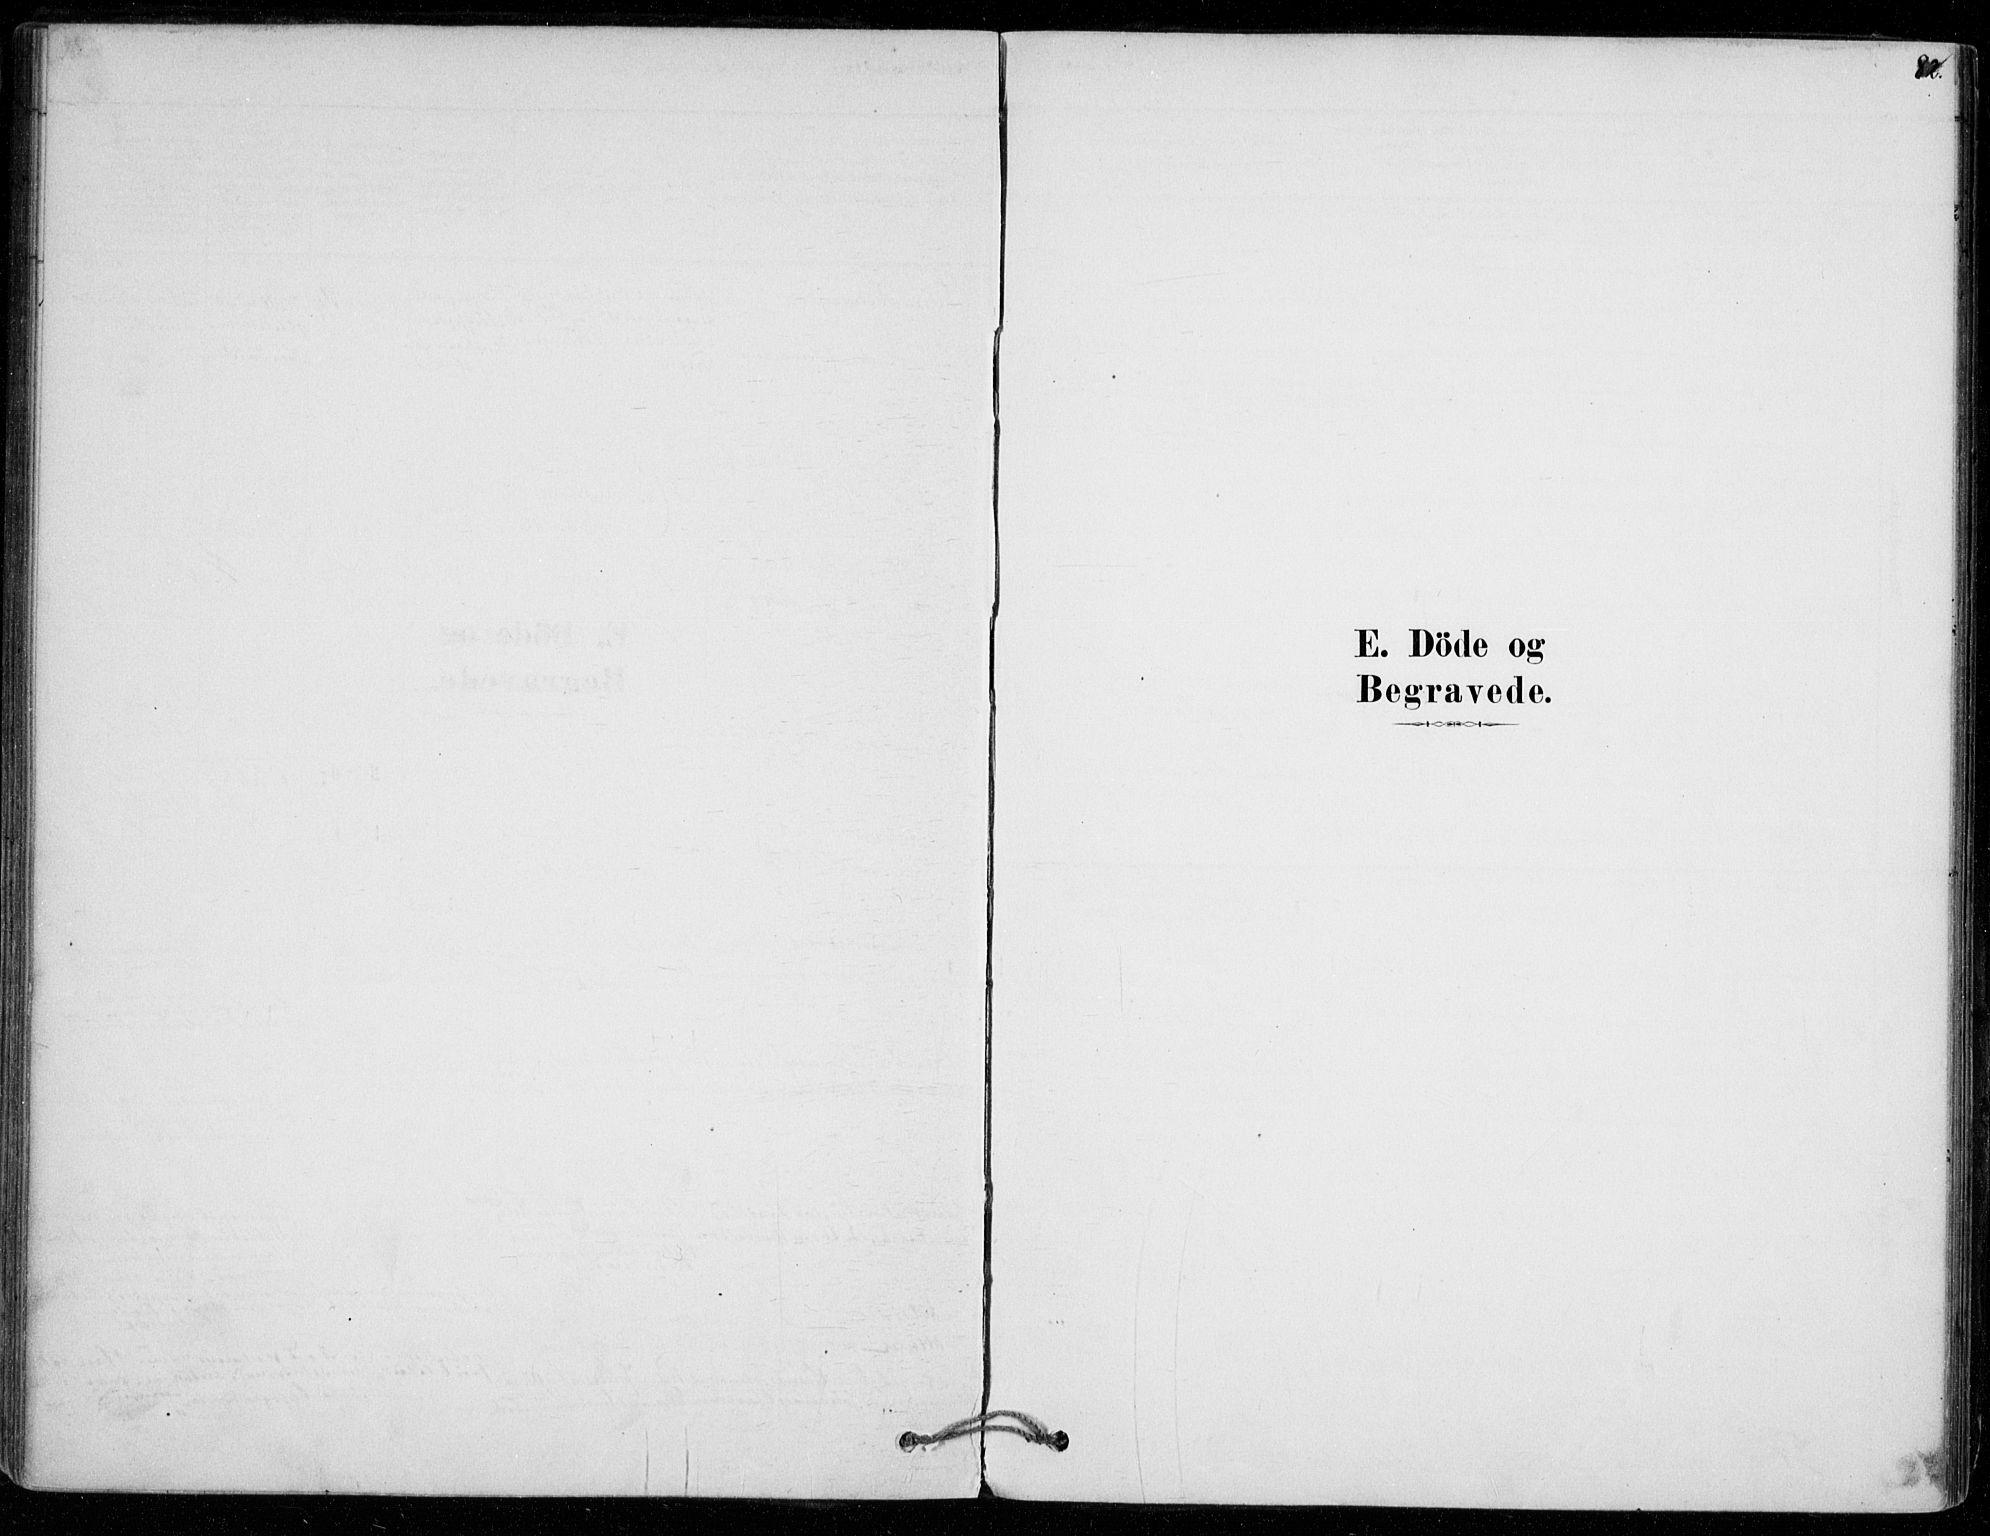 SAO, Vestby prestekontor Kirkebøker, F/Fe/L0001: Ministerialbok nr. V 1, 1878-1931, s. 82